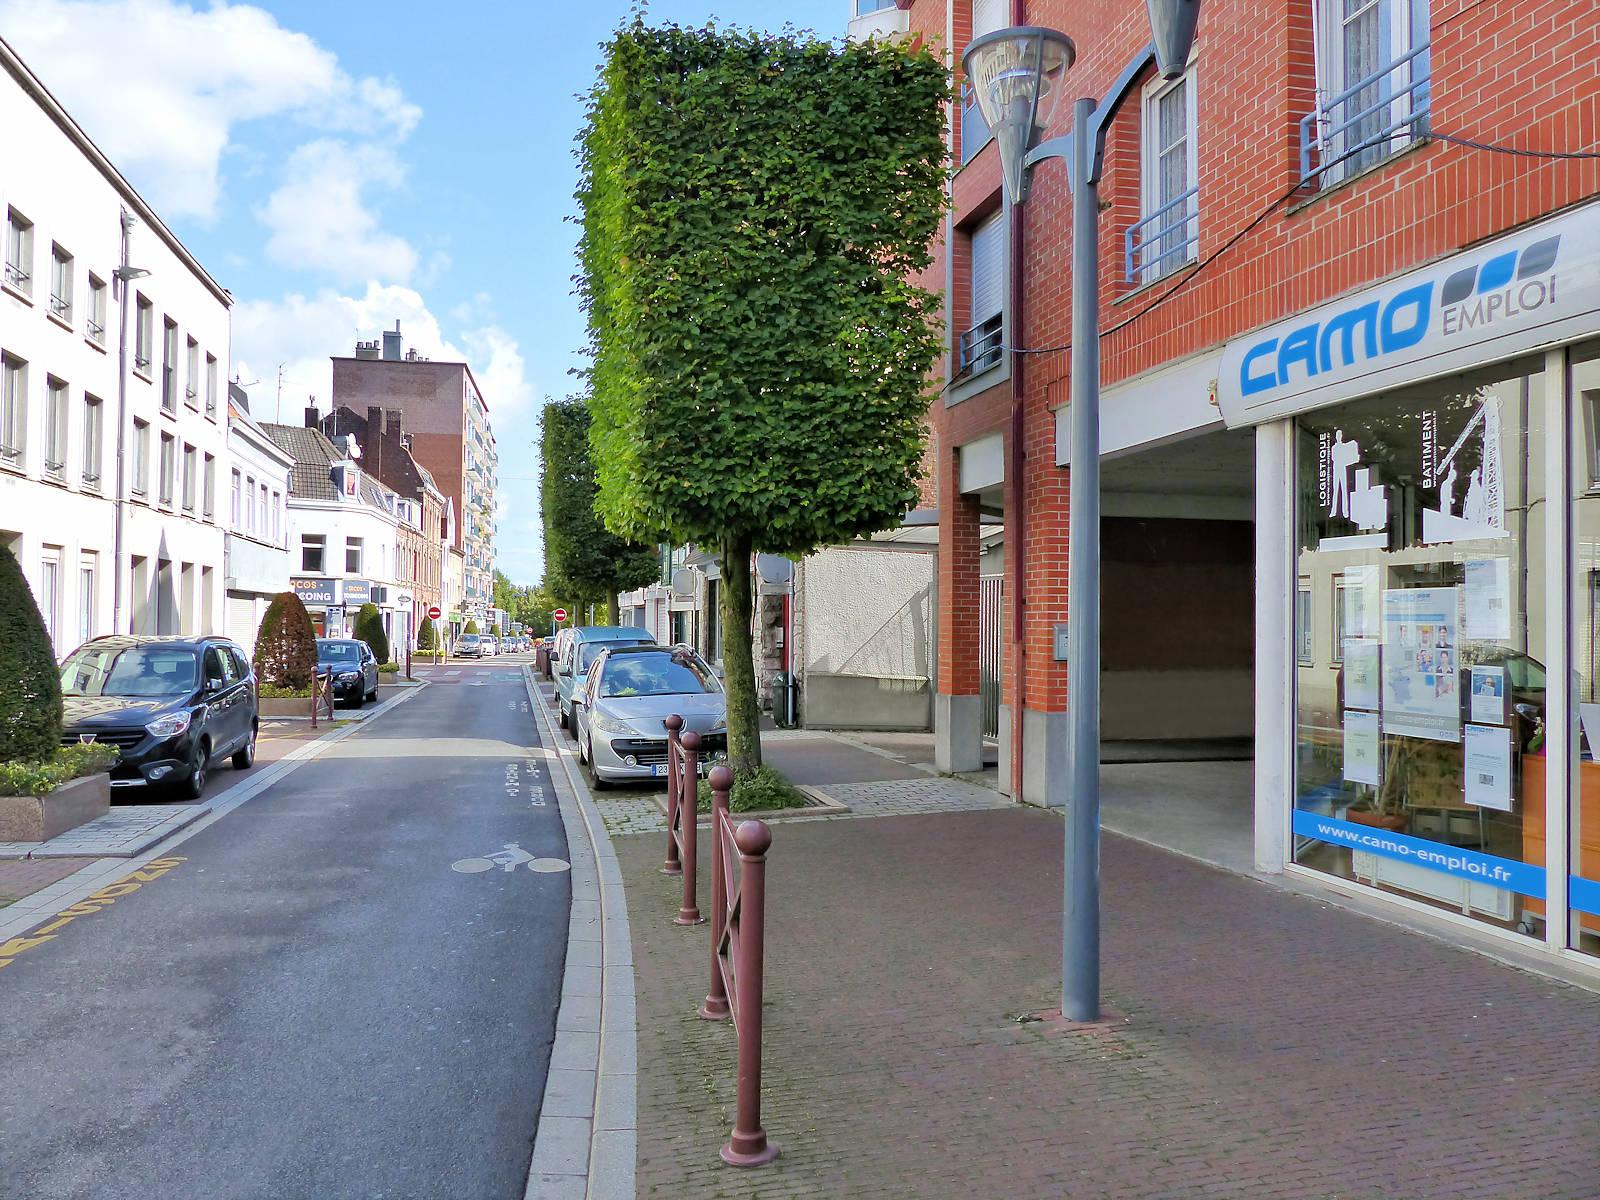 CAMO Emploi - Rue de la Cloche, Tourcoing.